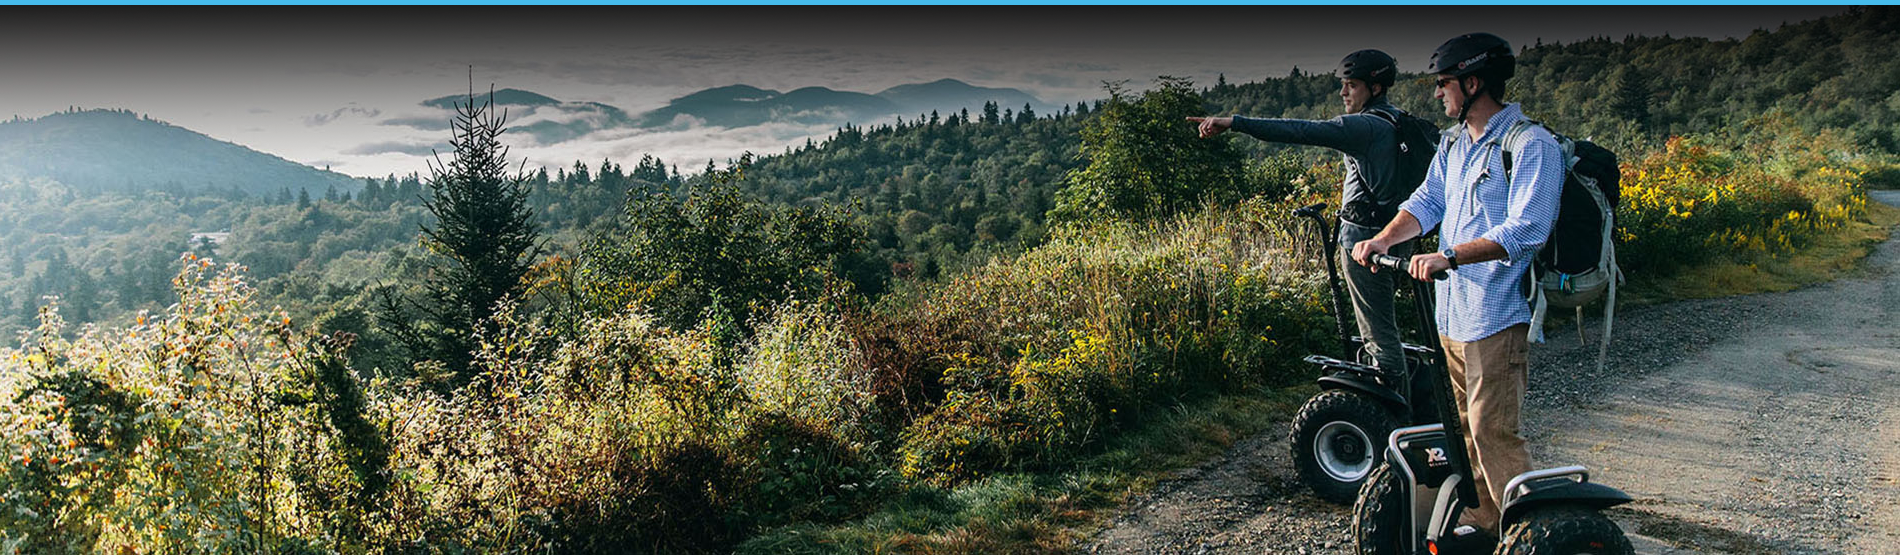 online buchungssystem segway titelbild